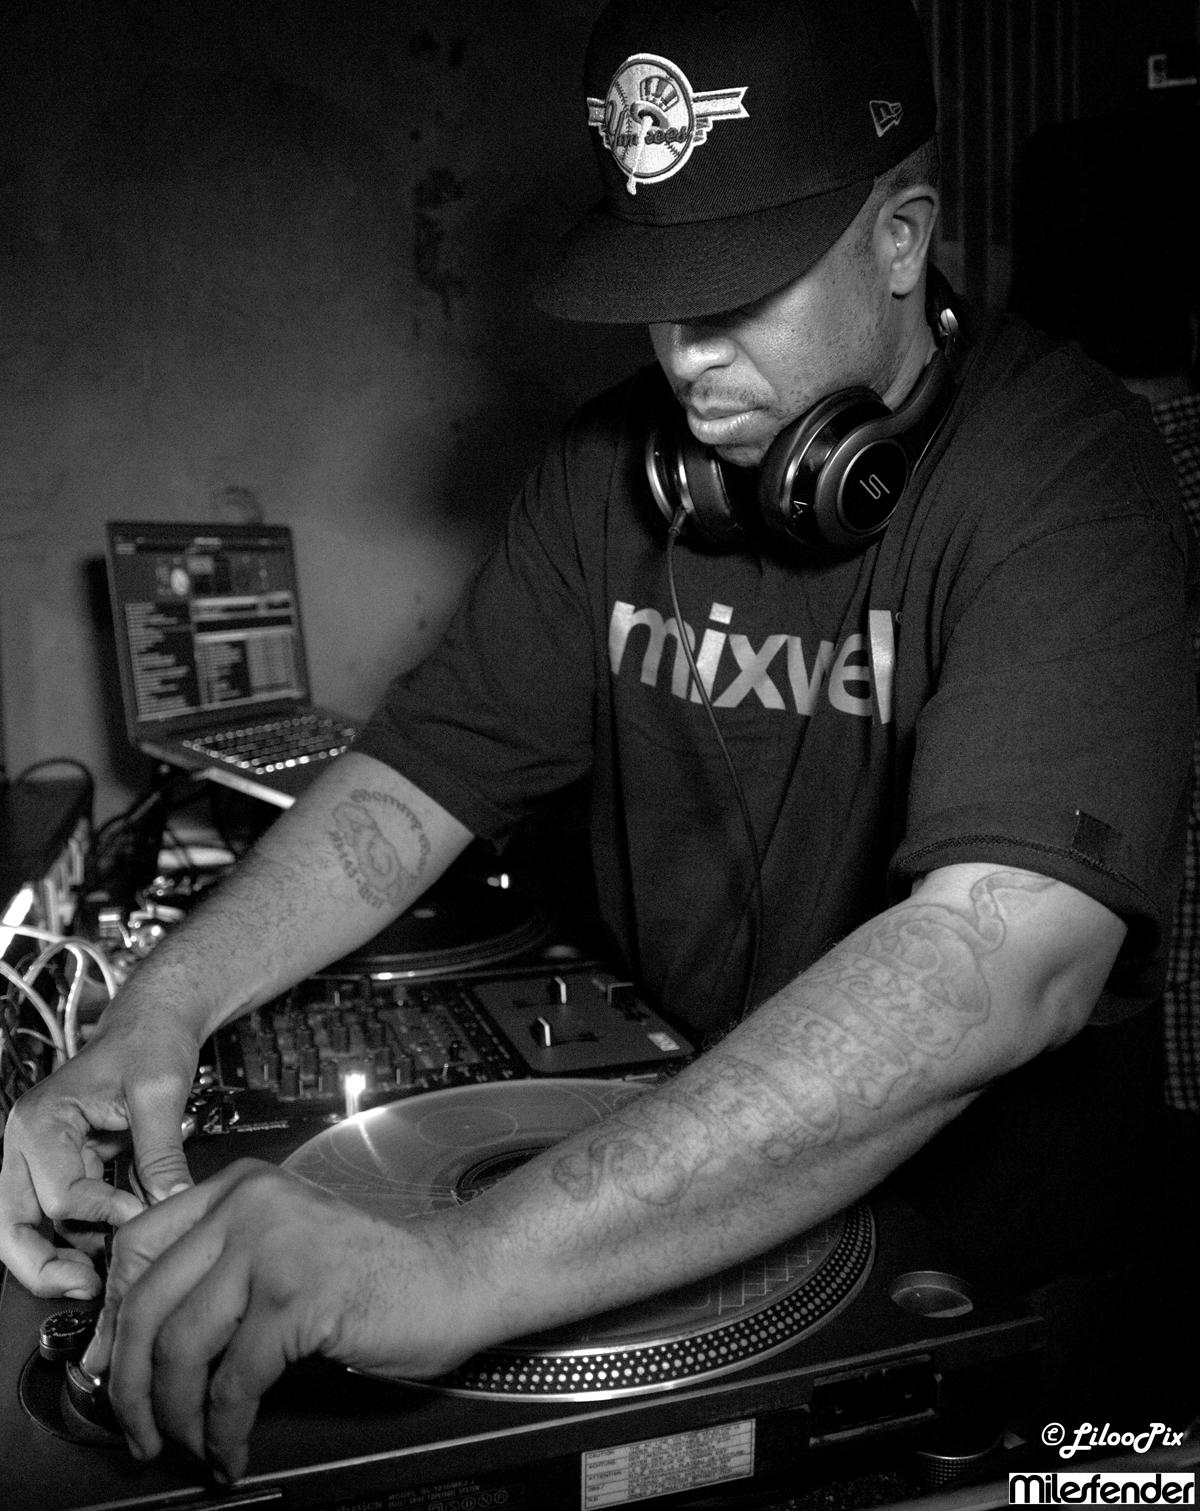 DJ PREMIER - LIVE FROM HEADQCOURTERZ RADIO SHOW FOR THE